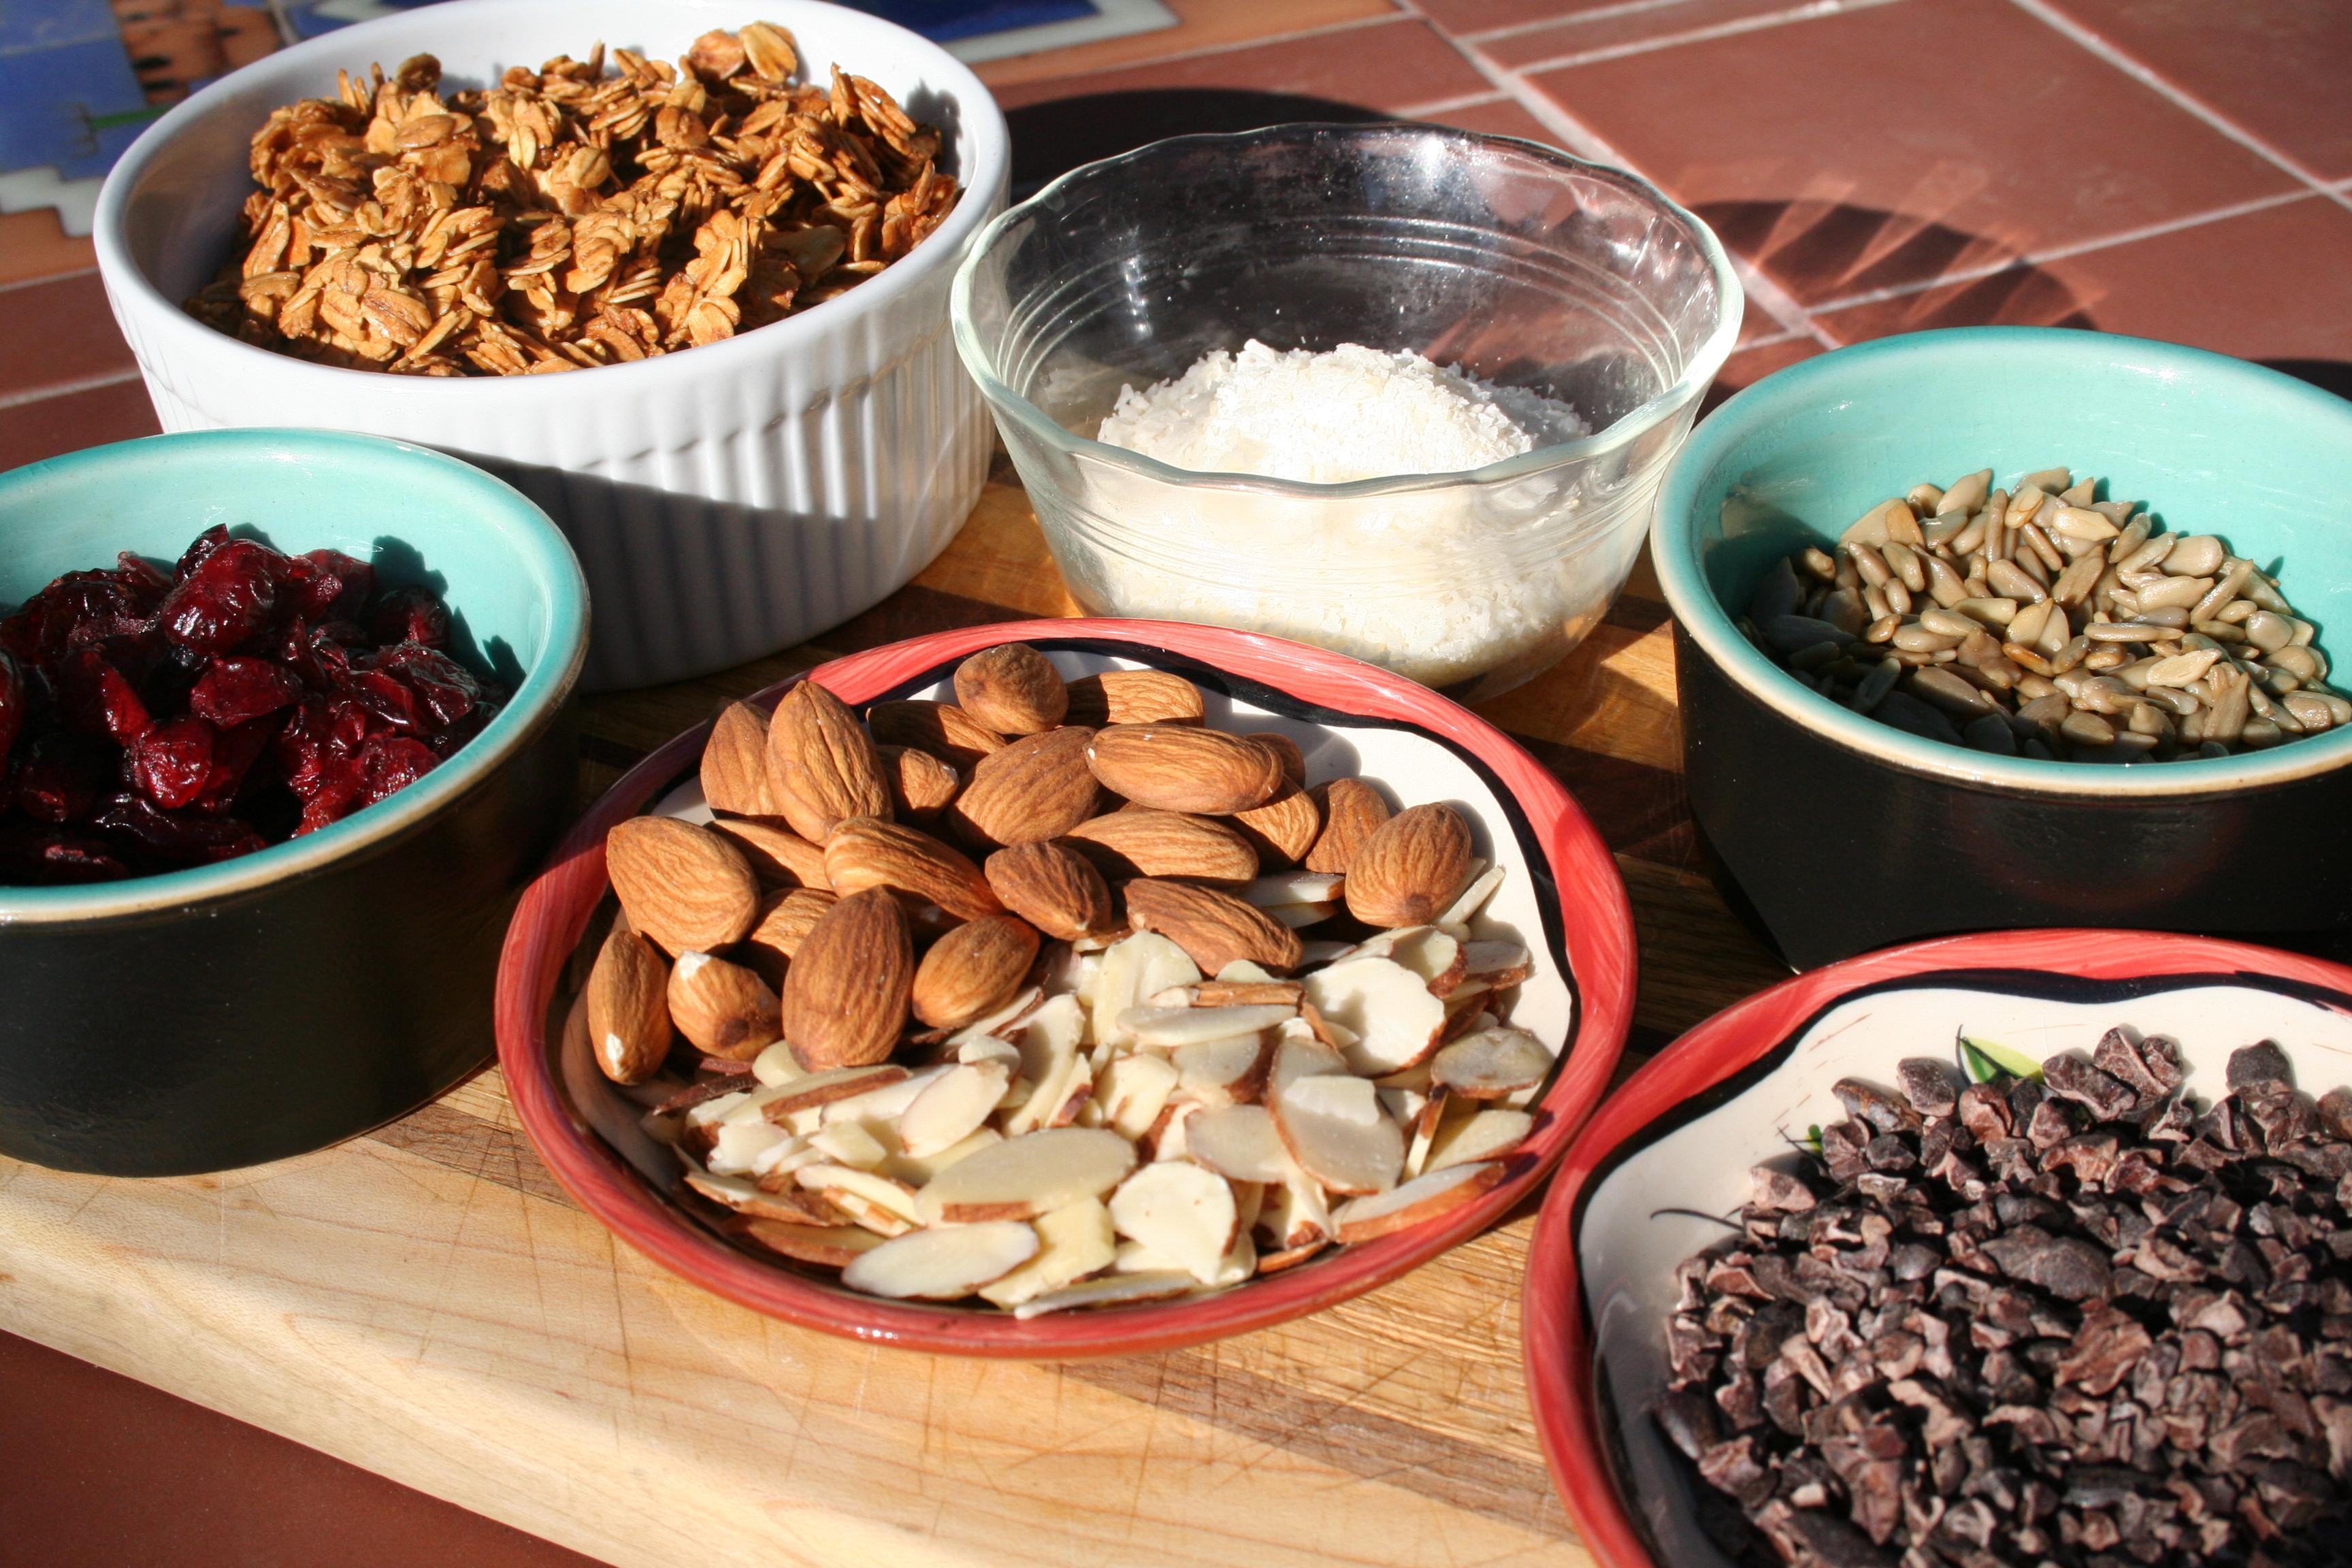 Trail Mix with Vanilla Almond Granola ingredients.